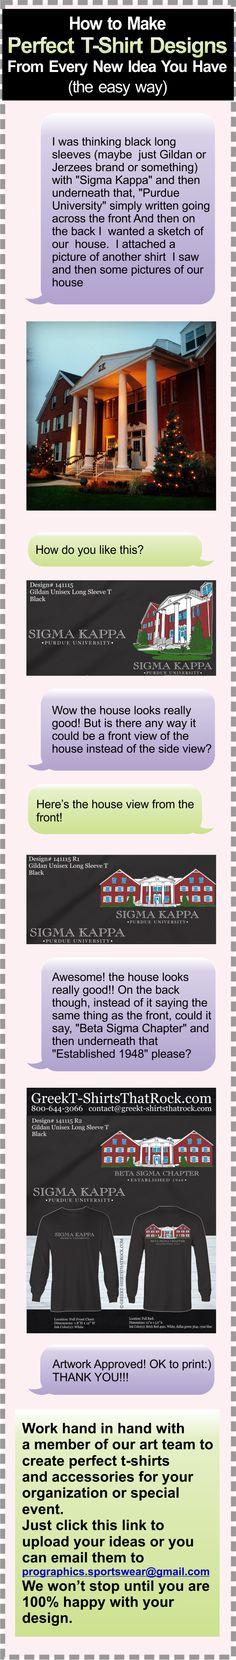 Sigma Kappa Purdue University